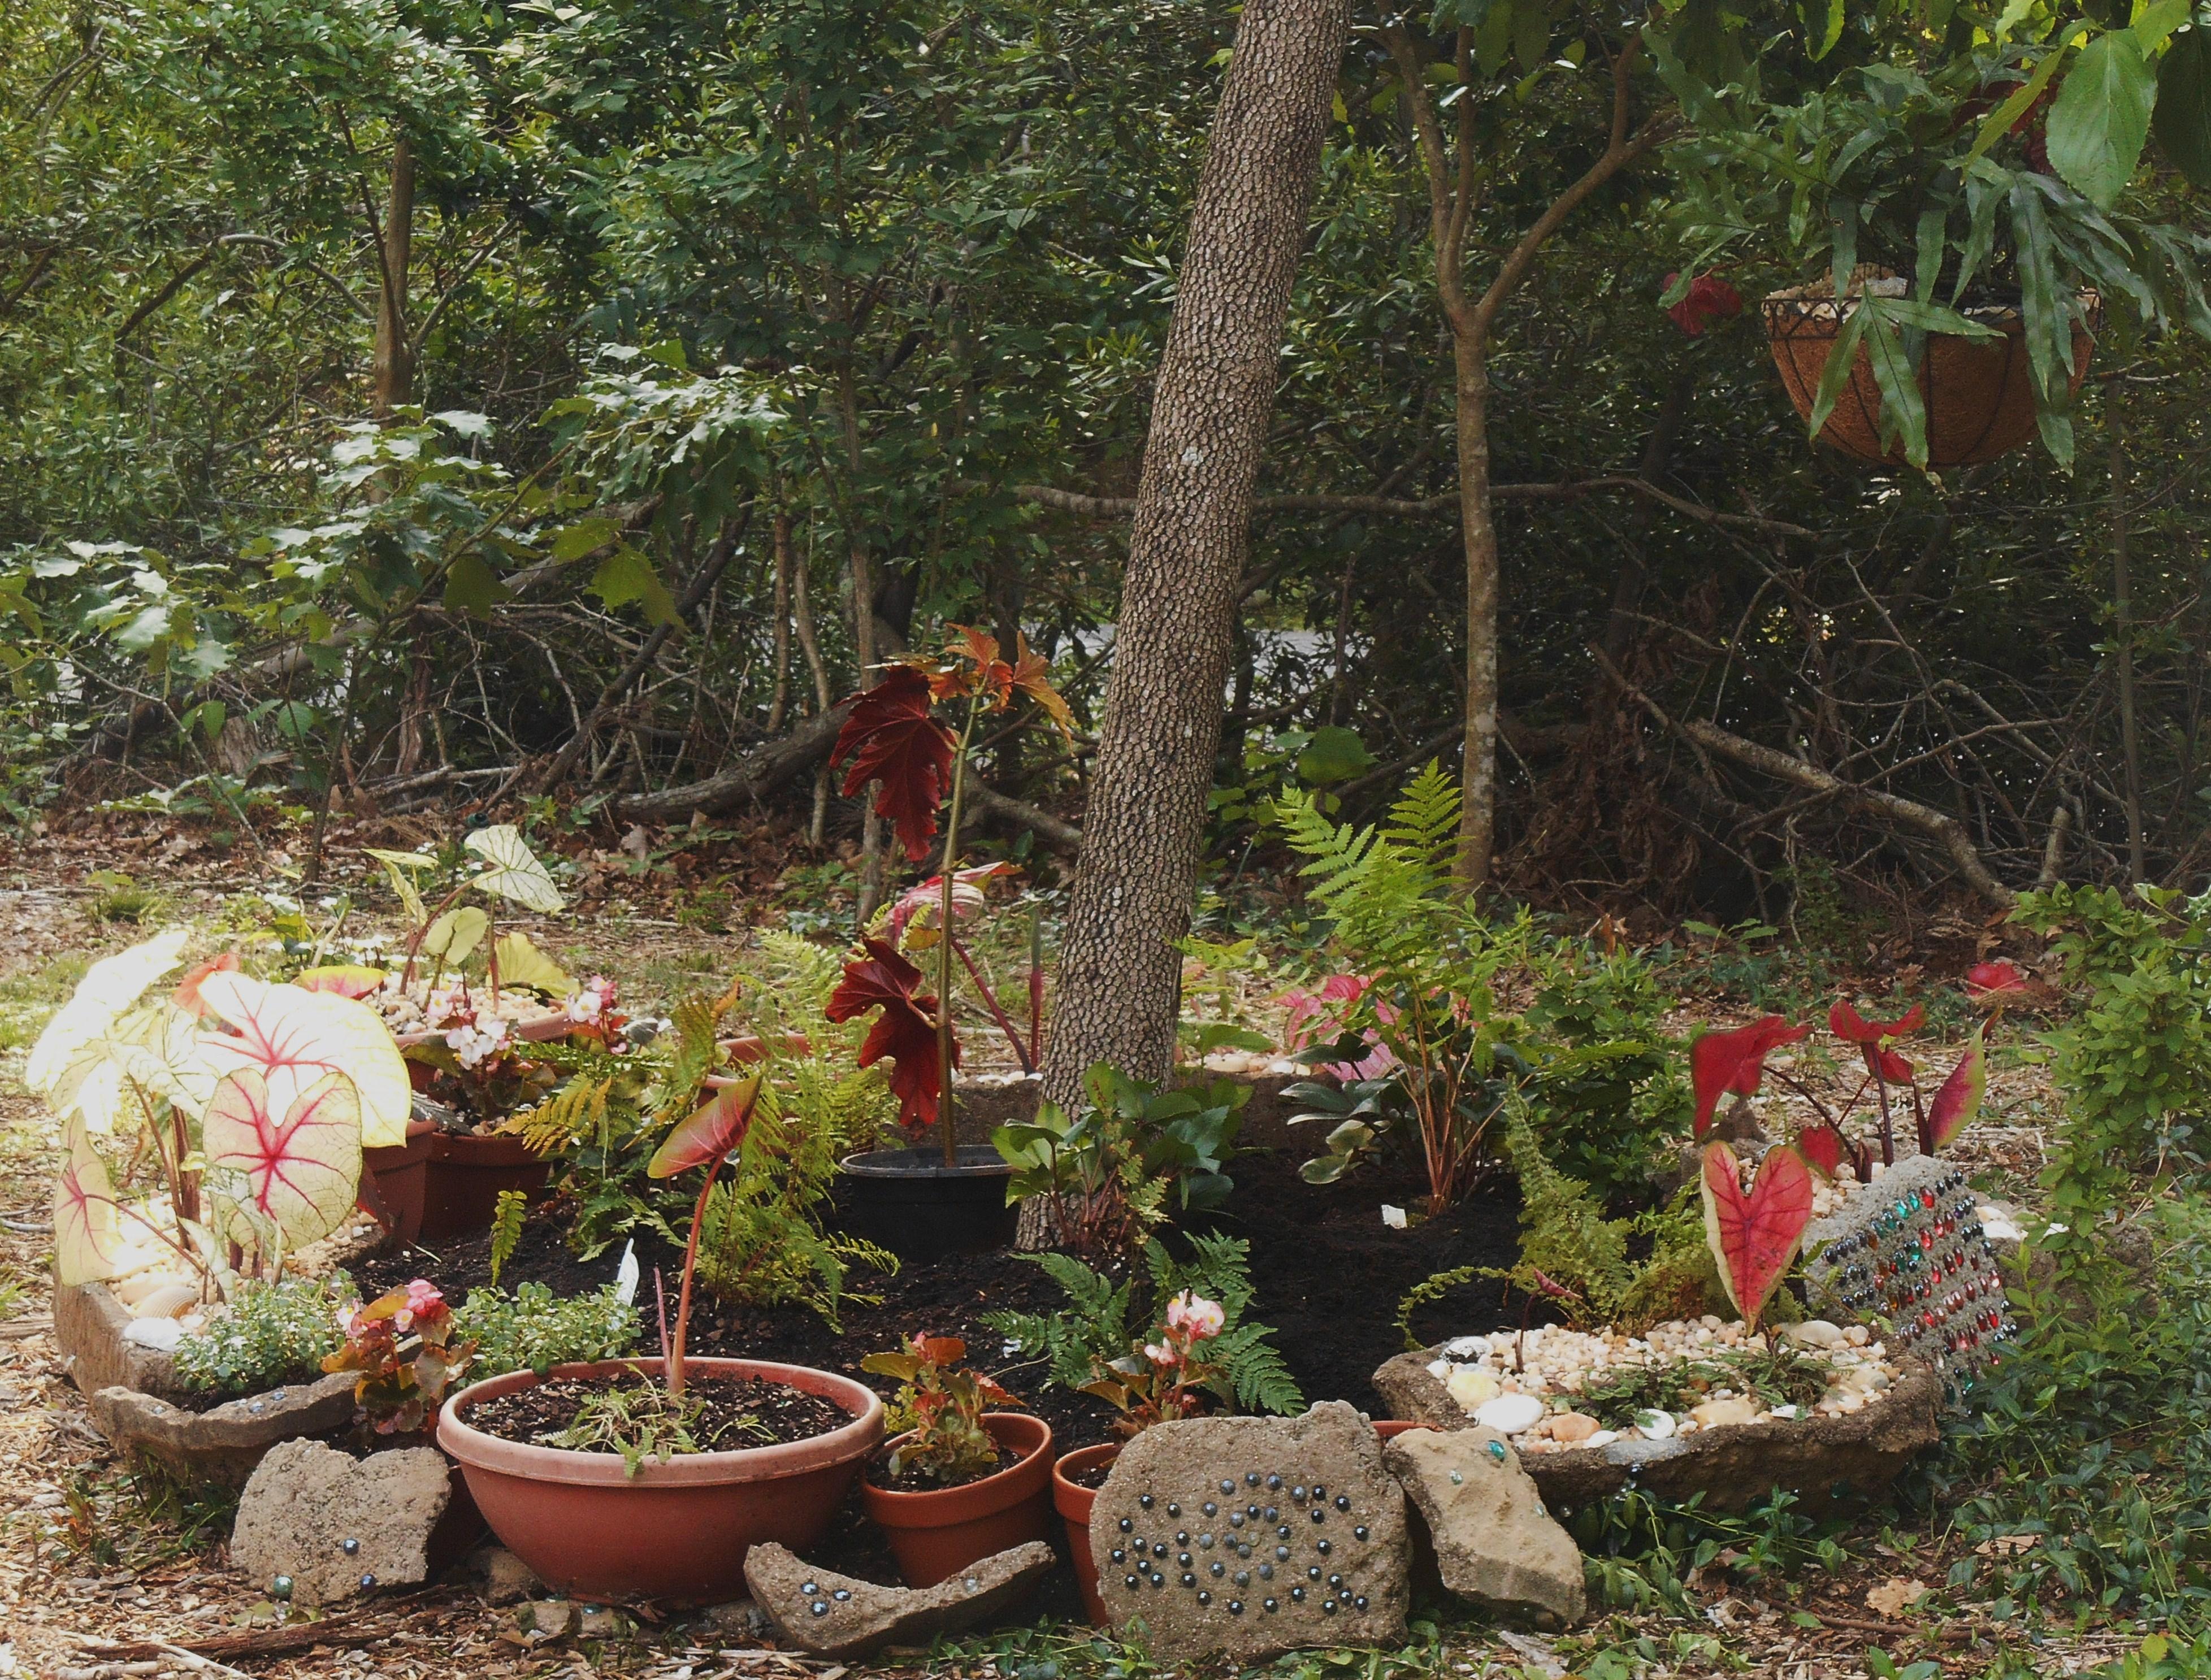 May 20, 2014 Garden 001